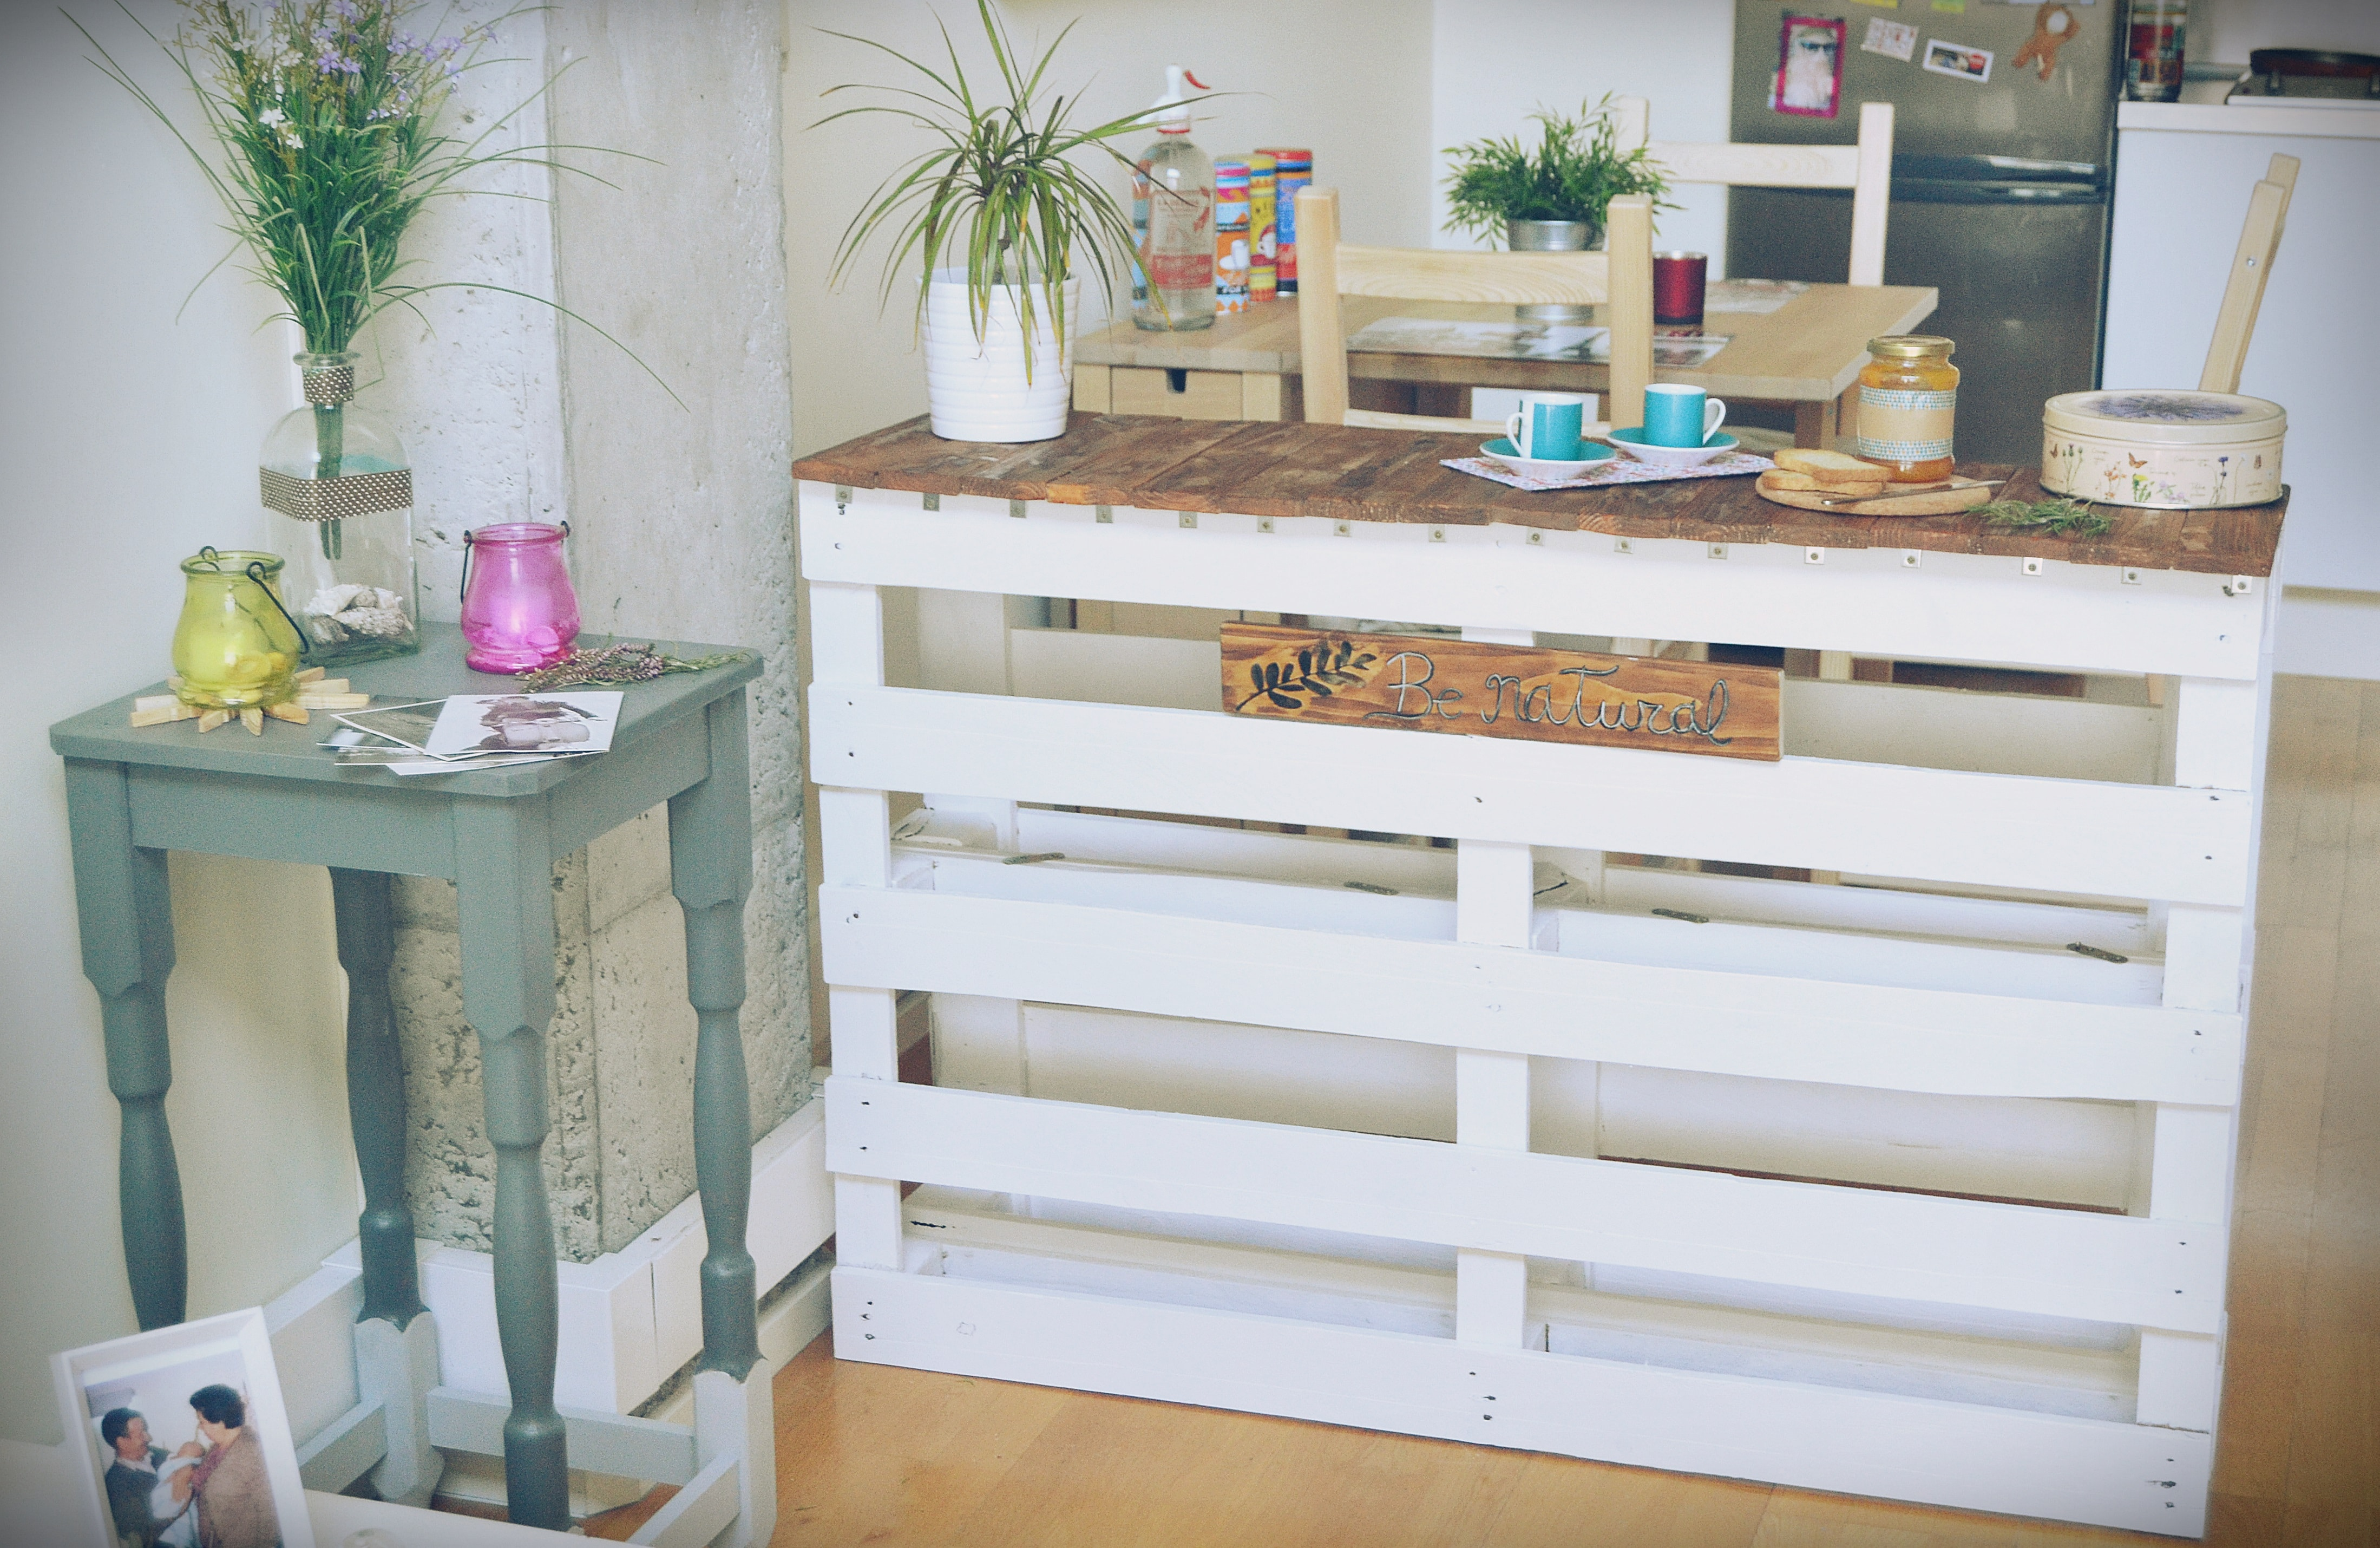 Muebles palets jardin exterior 20170730082844 - Ideas con palets de madera ...